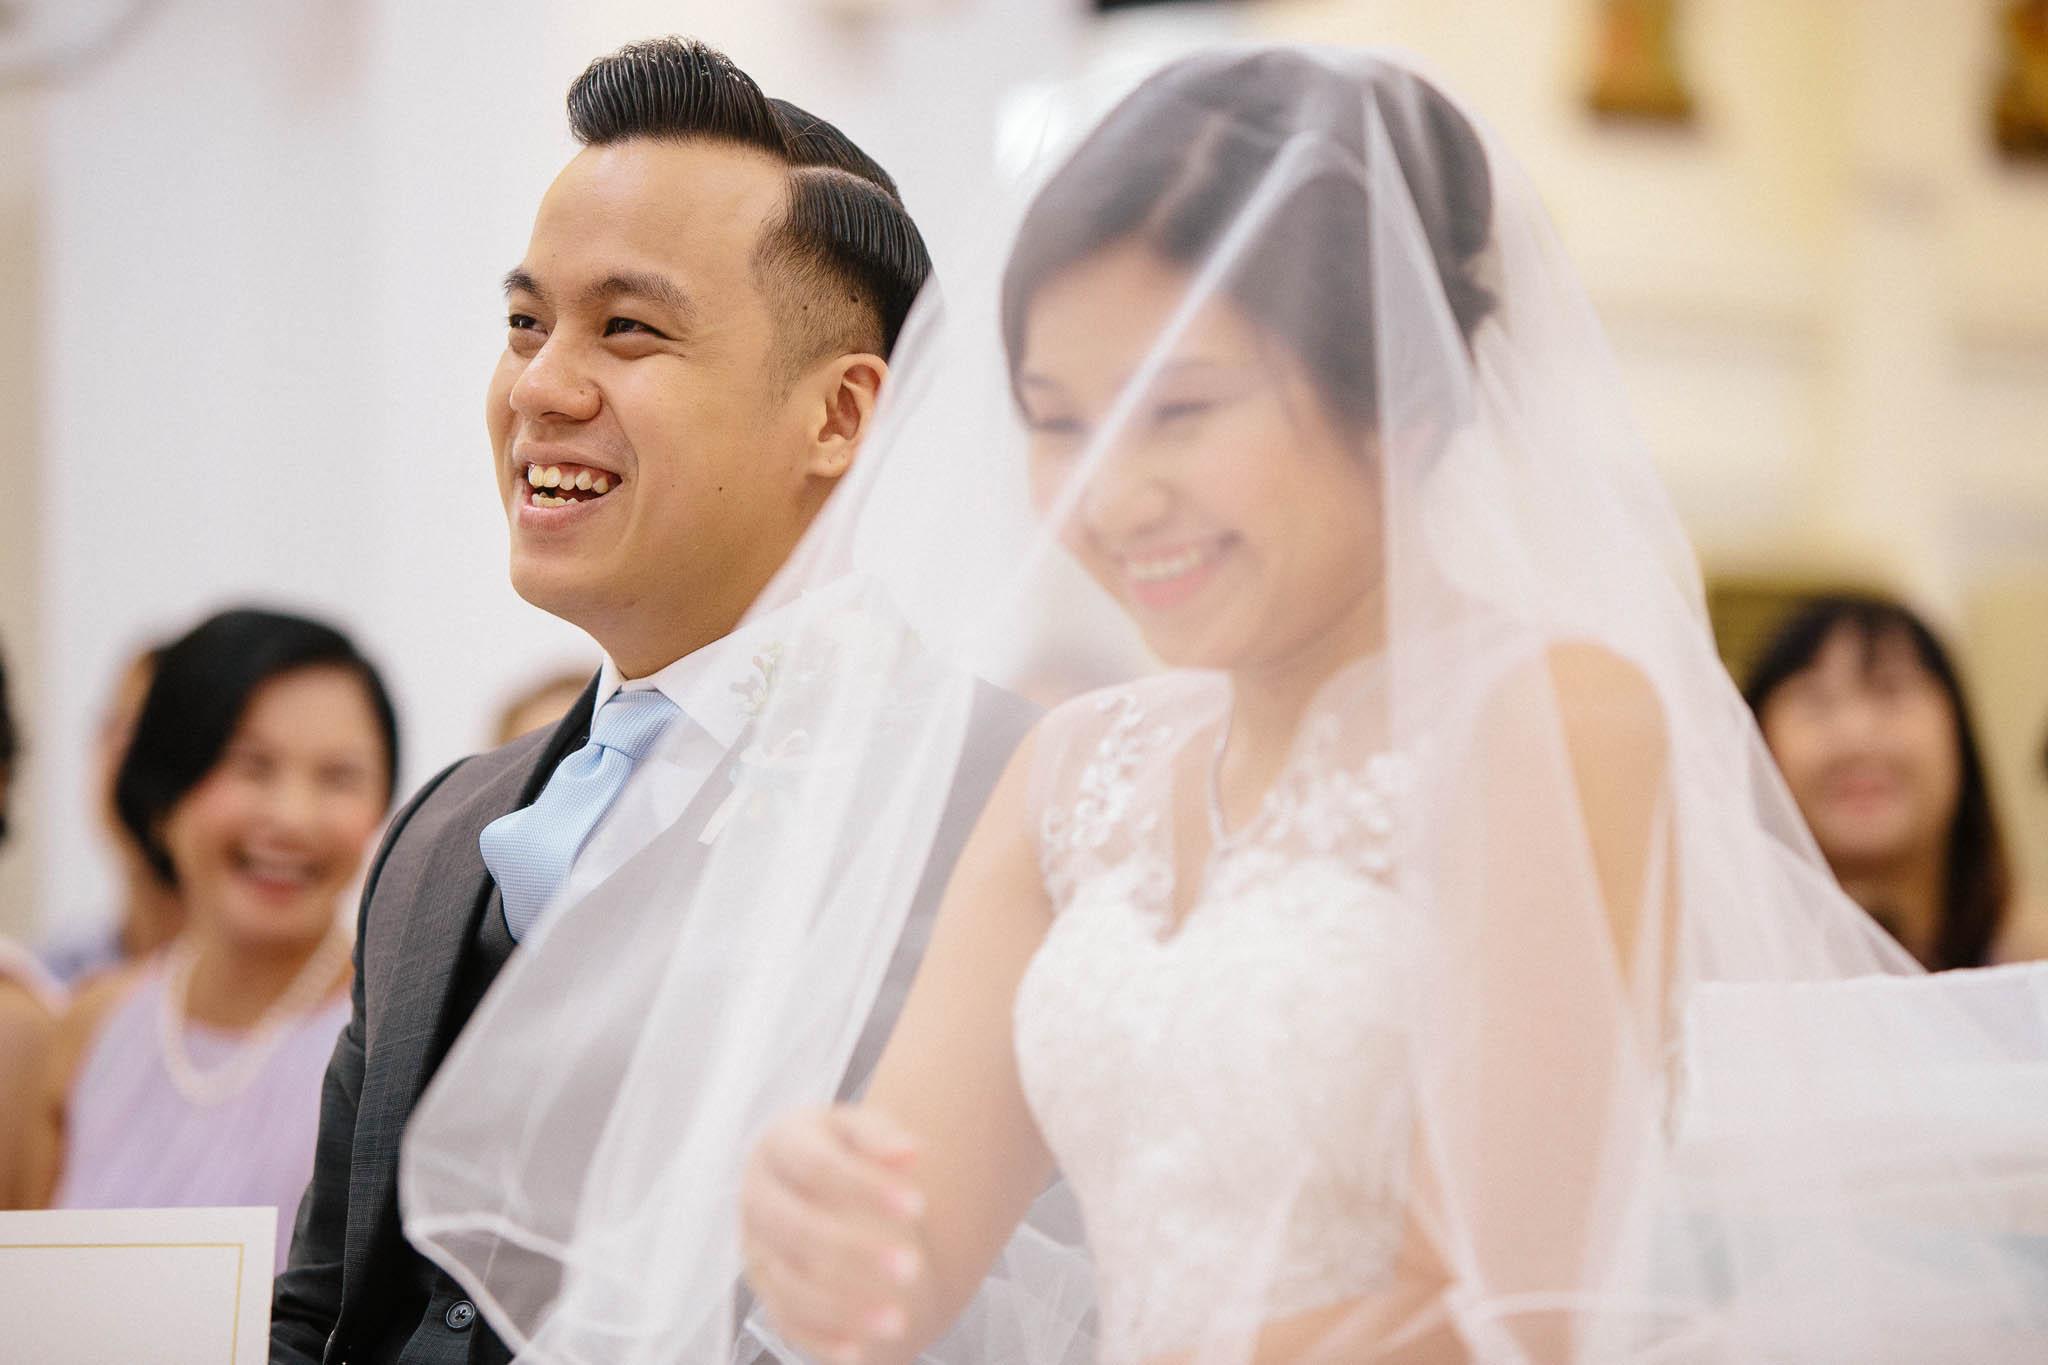 singapore-wedding-photographer-malay-indian-pre-wedding-travel-wmt-2015-35.jpg